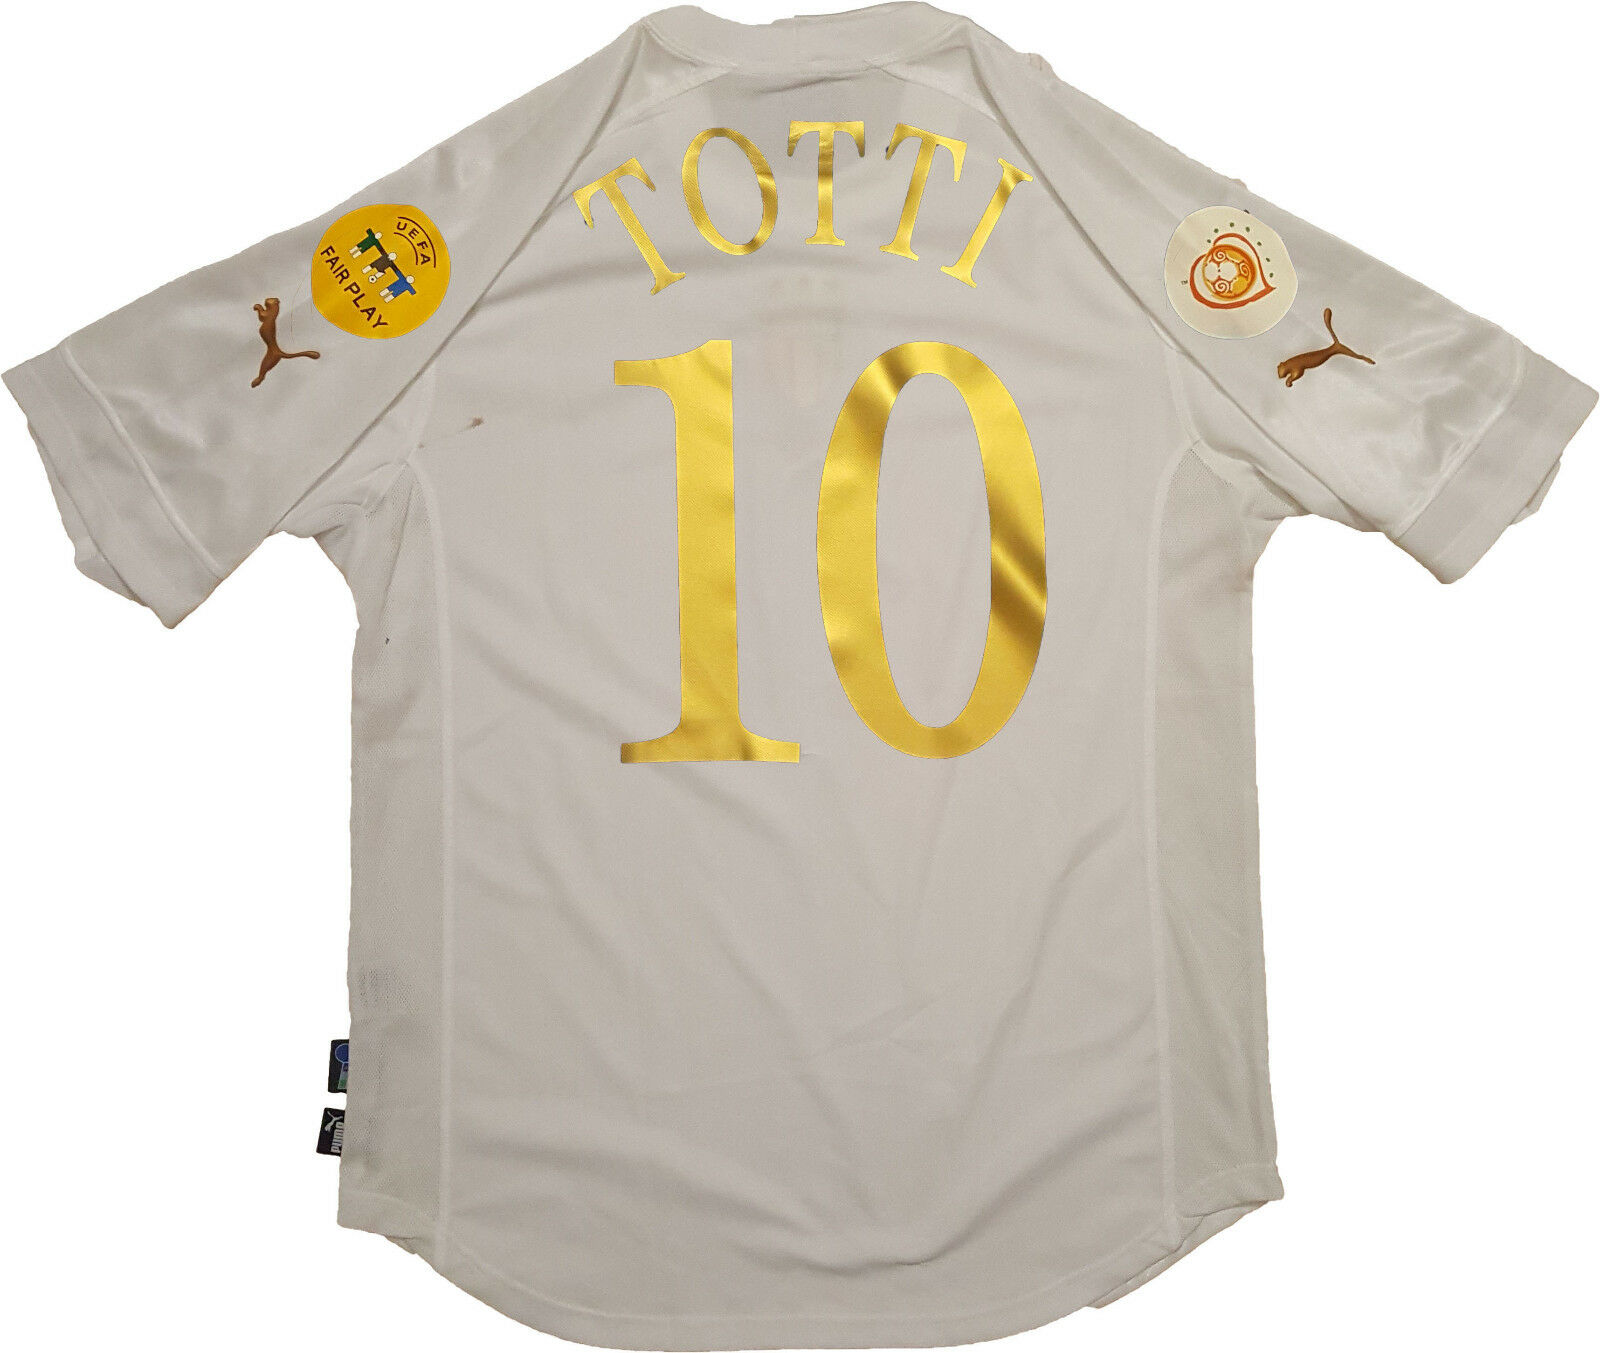 Maglia totti italy Euro 2004 Portugal Jersey home XL Puma shirt vintage